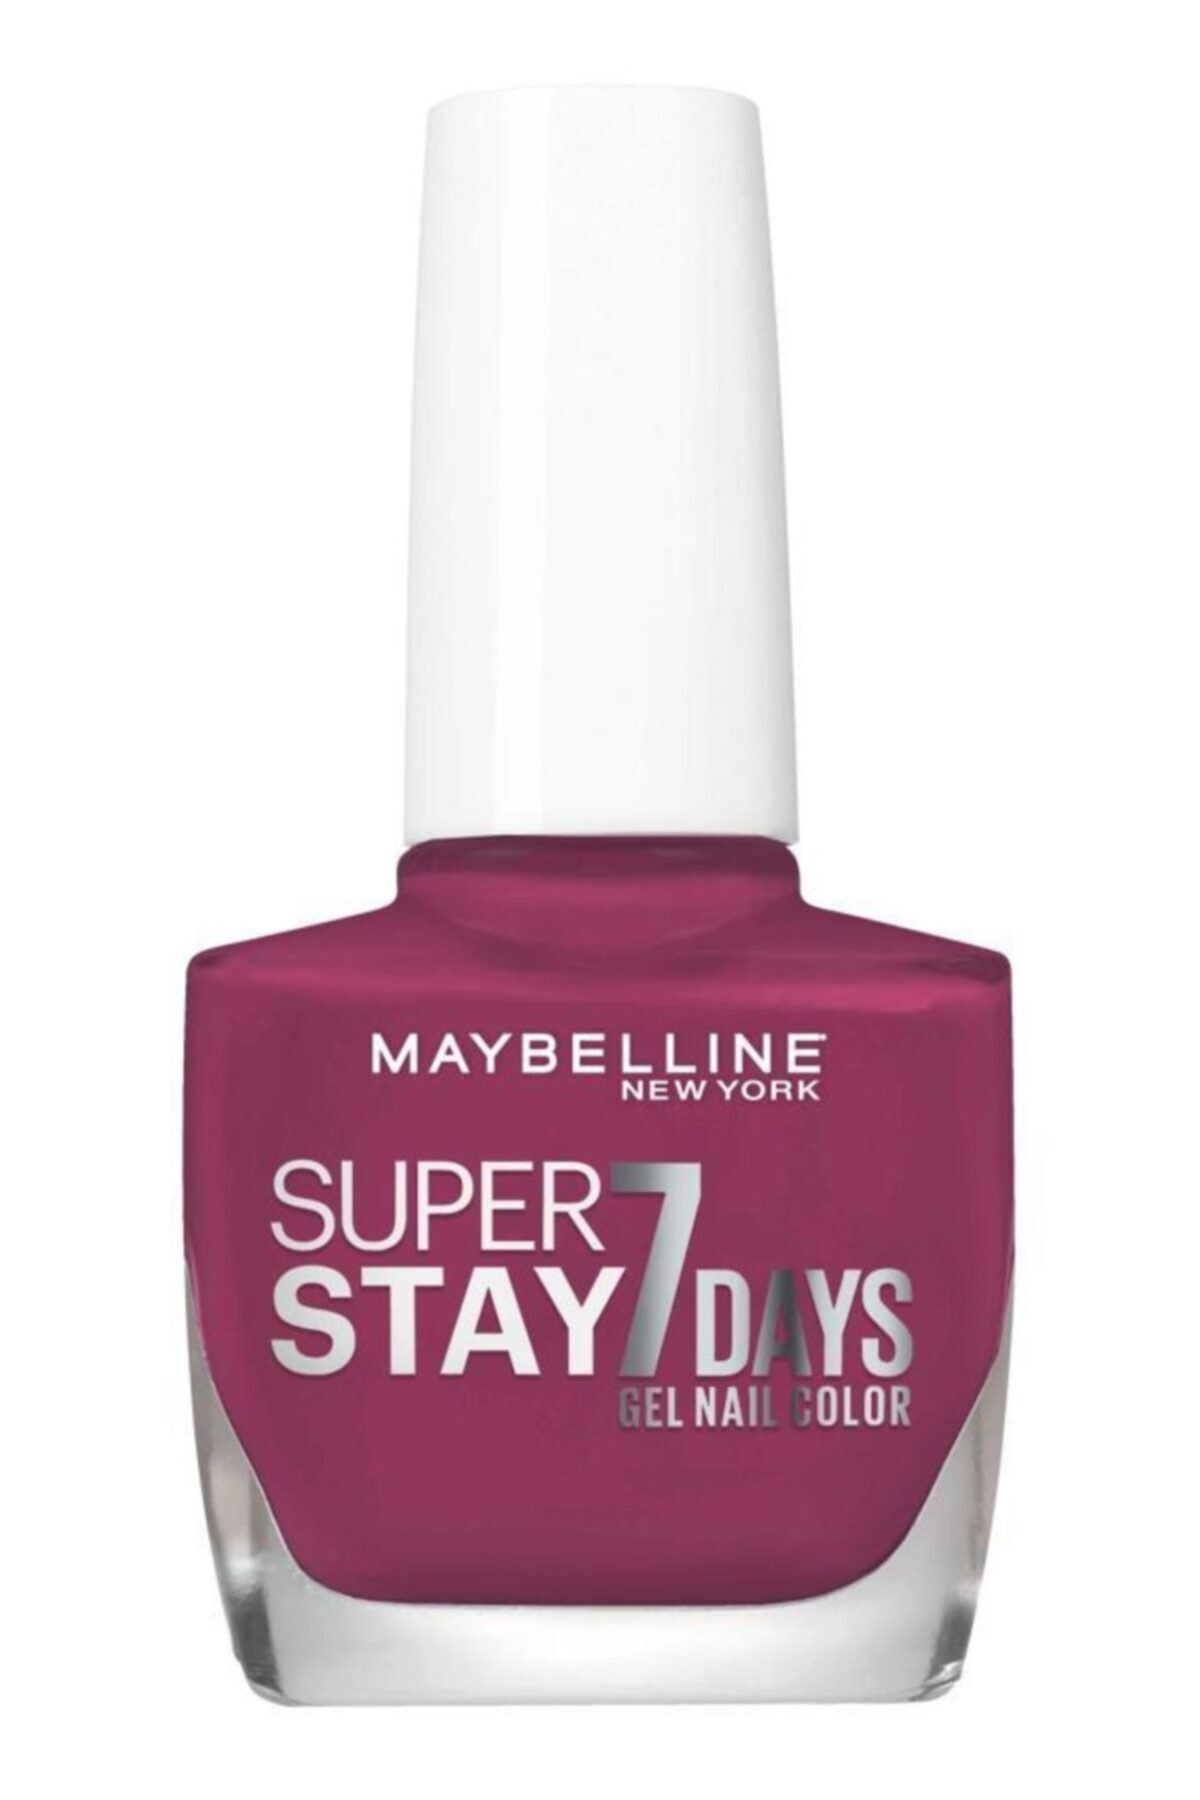 Maybelline New York Super Stay Oje- 255 Mauve On 1